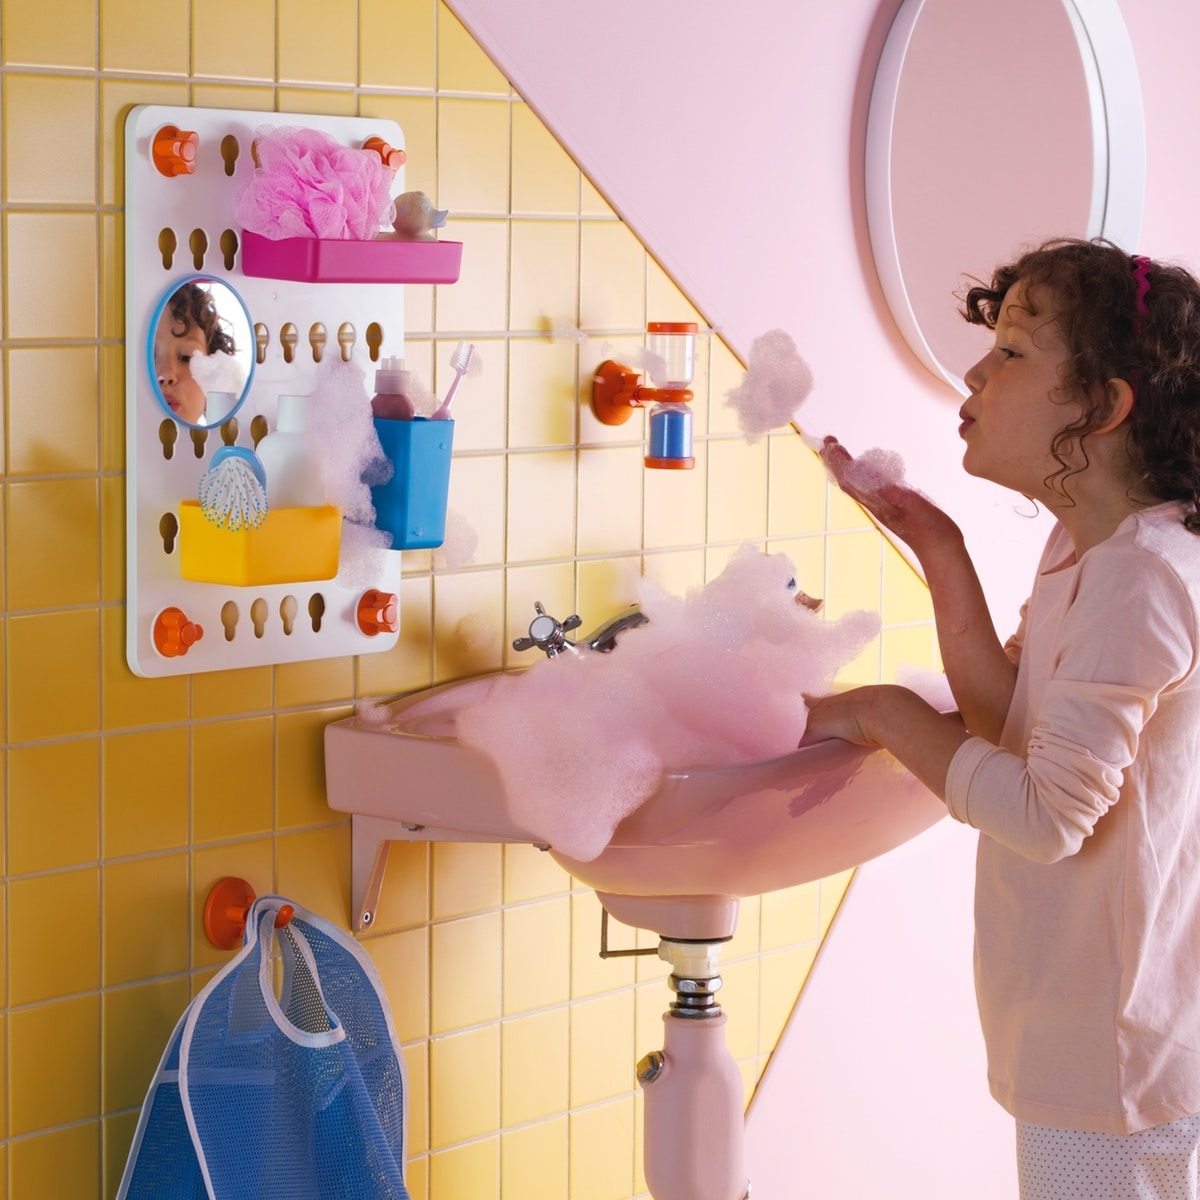 Ide kamar mandi unik ramah anak